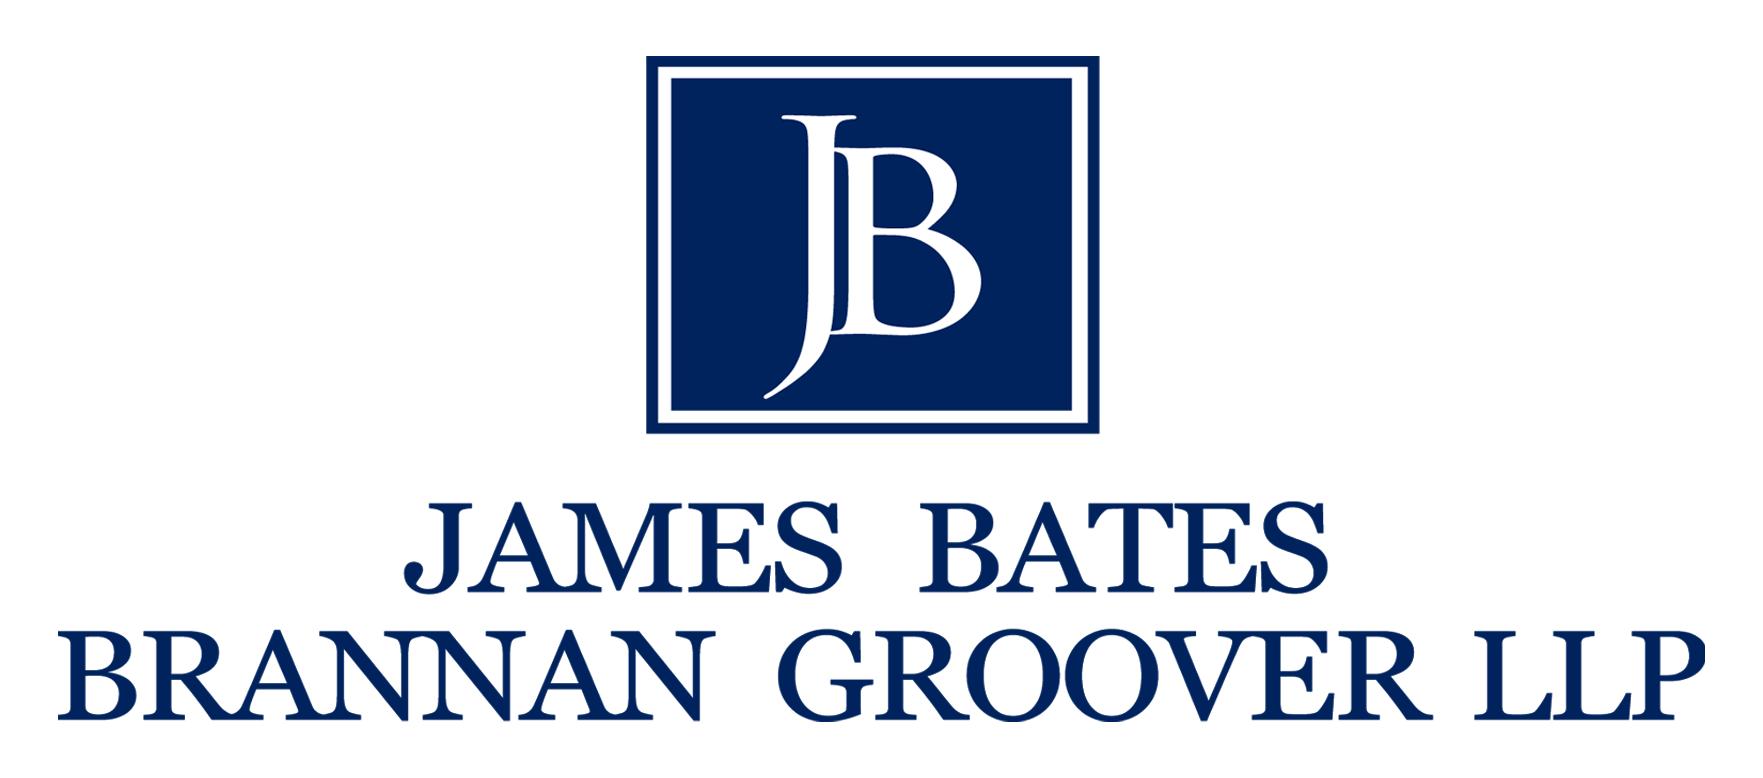 James Bates Brannan Groover LLP